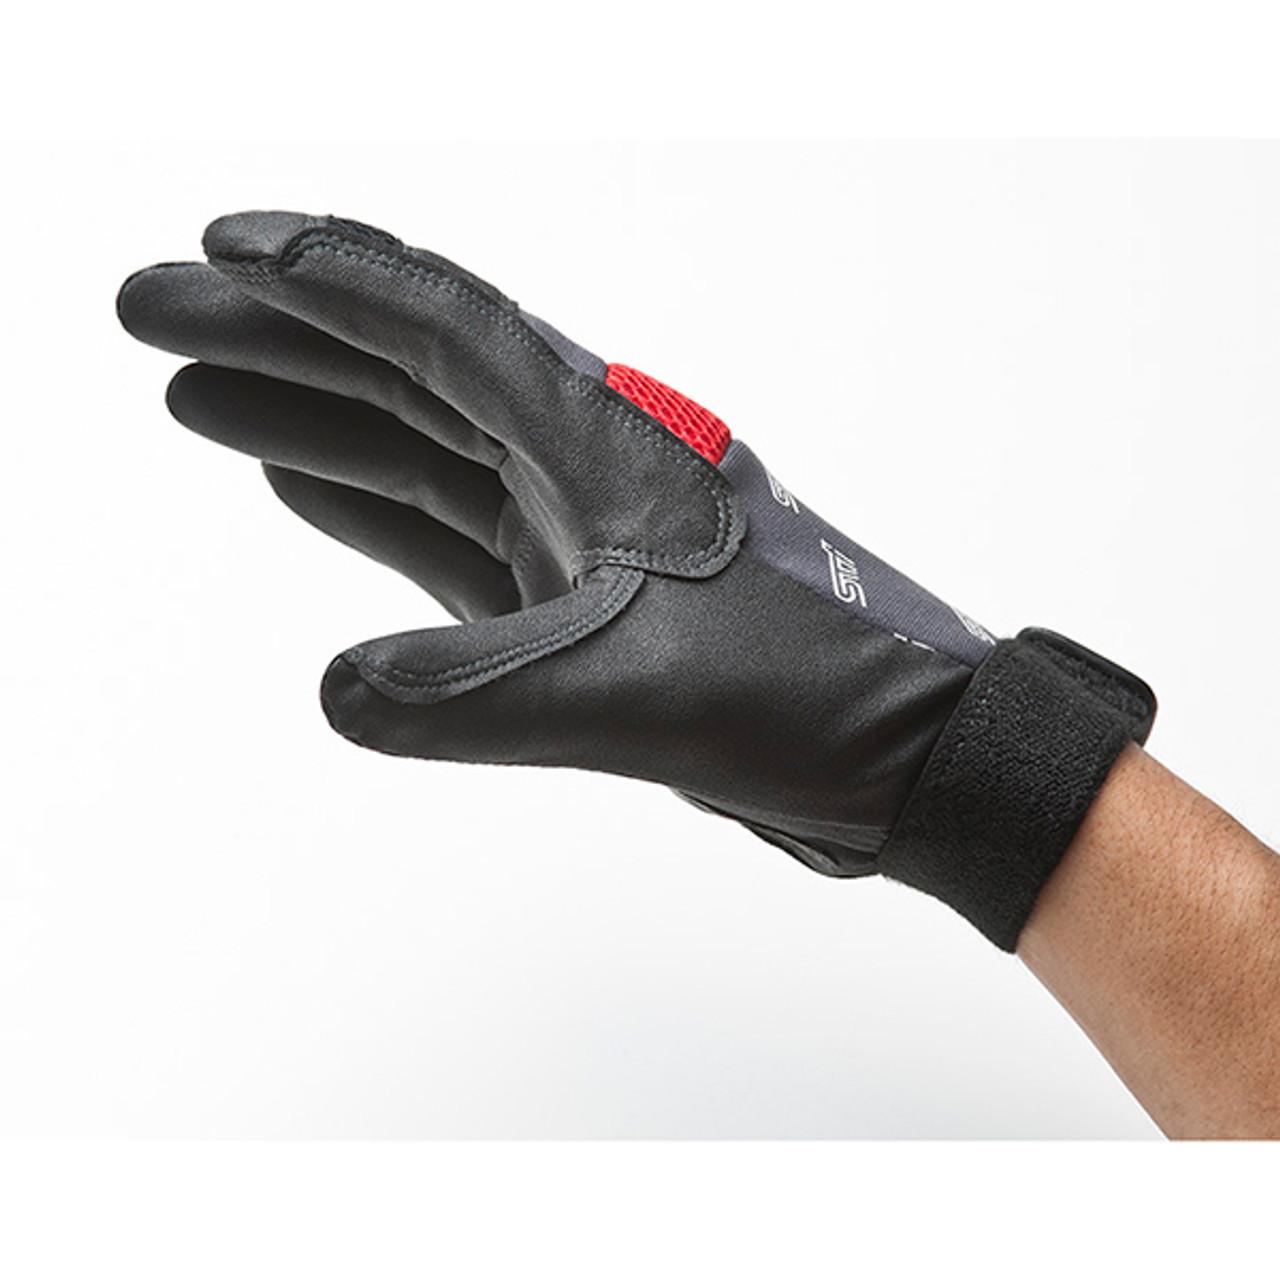 STI Mechanic Glove STSG13100*** at AVOJDM.com